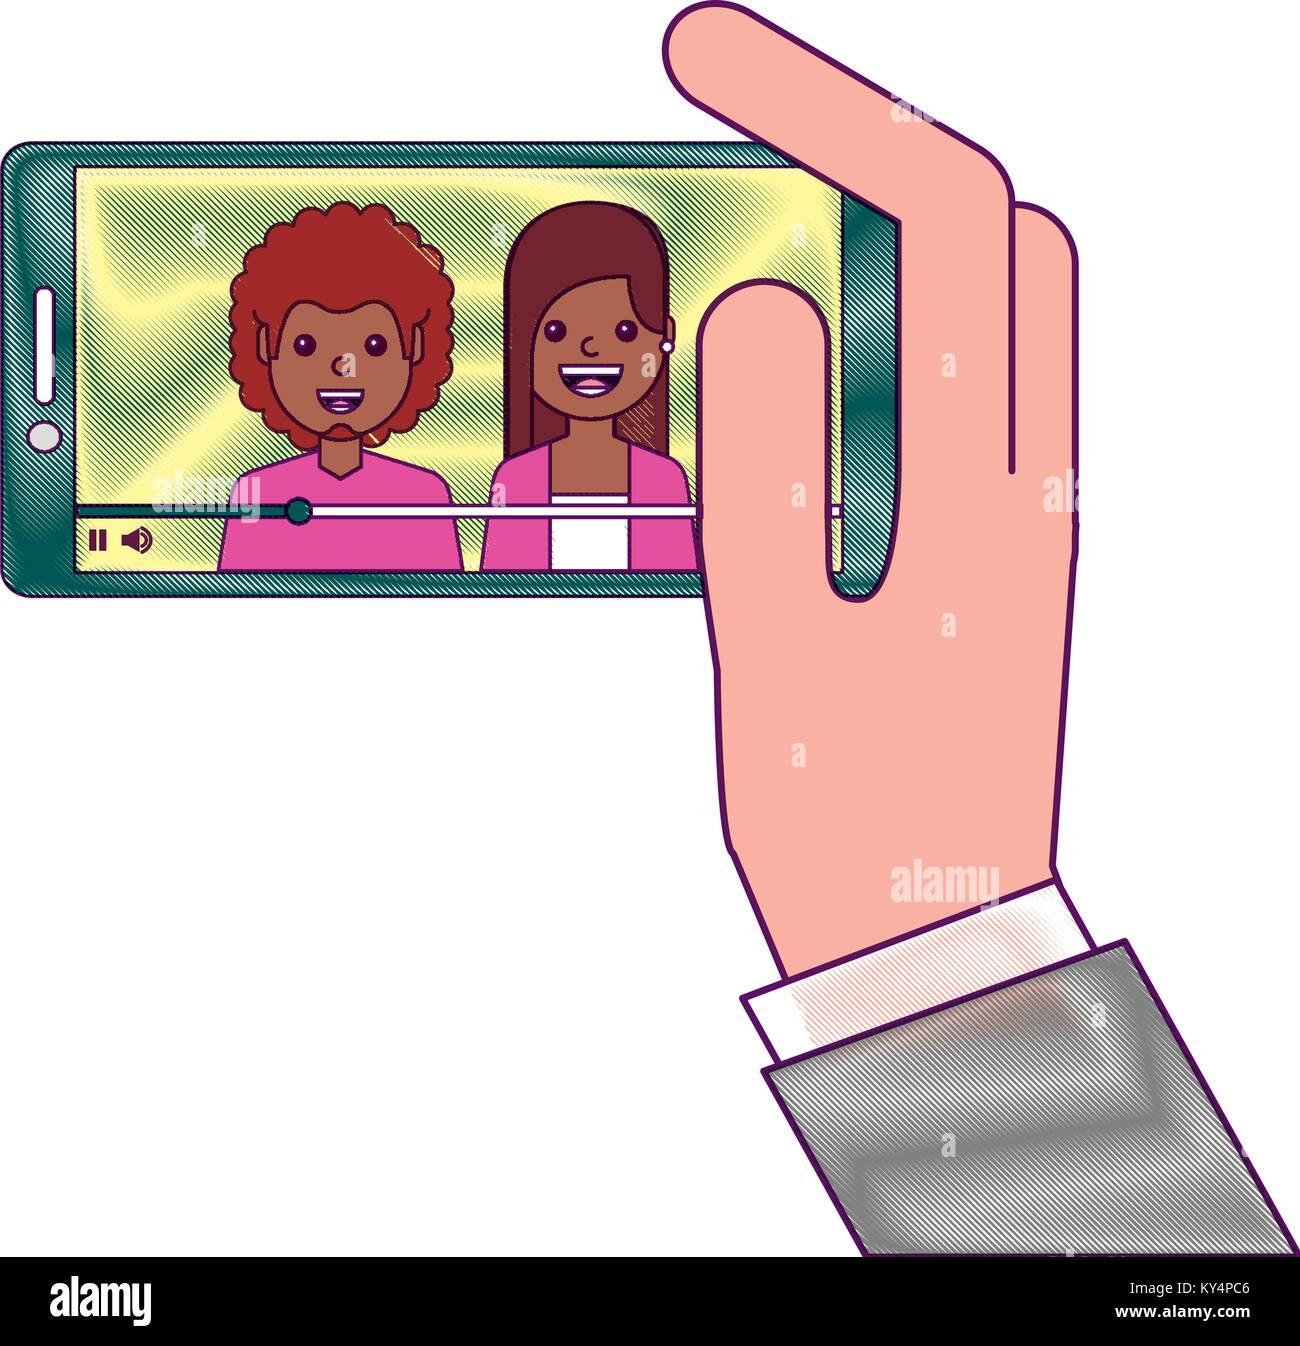 Mano Sujetando Teléfono Móvil Con Personas Video Player